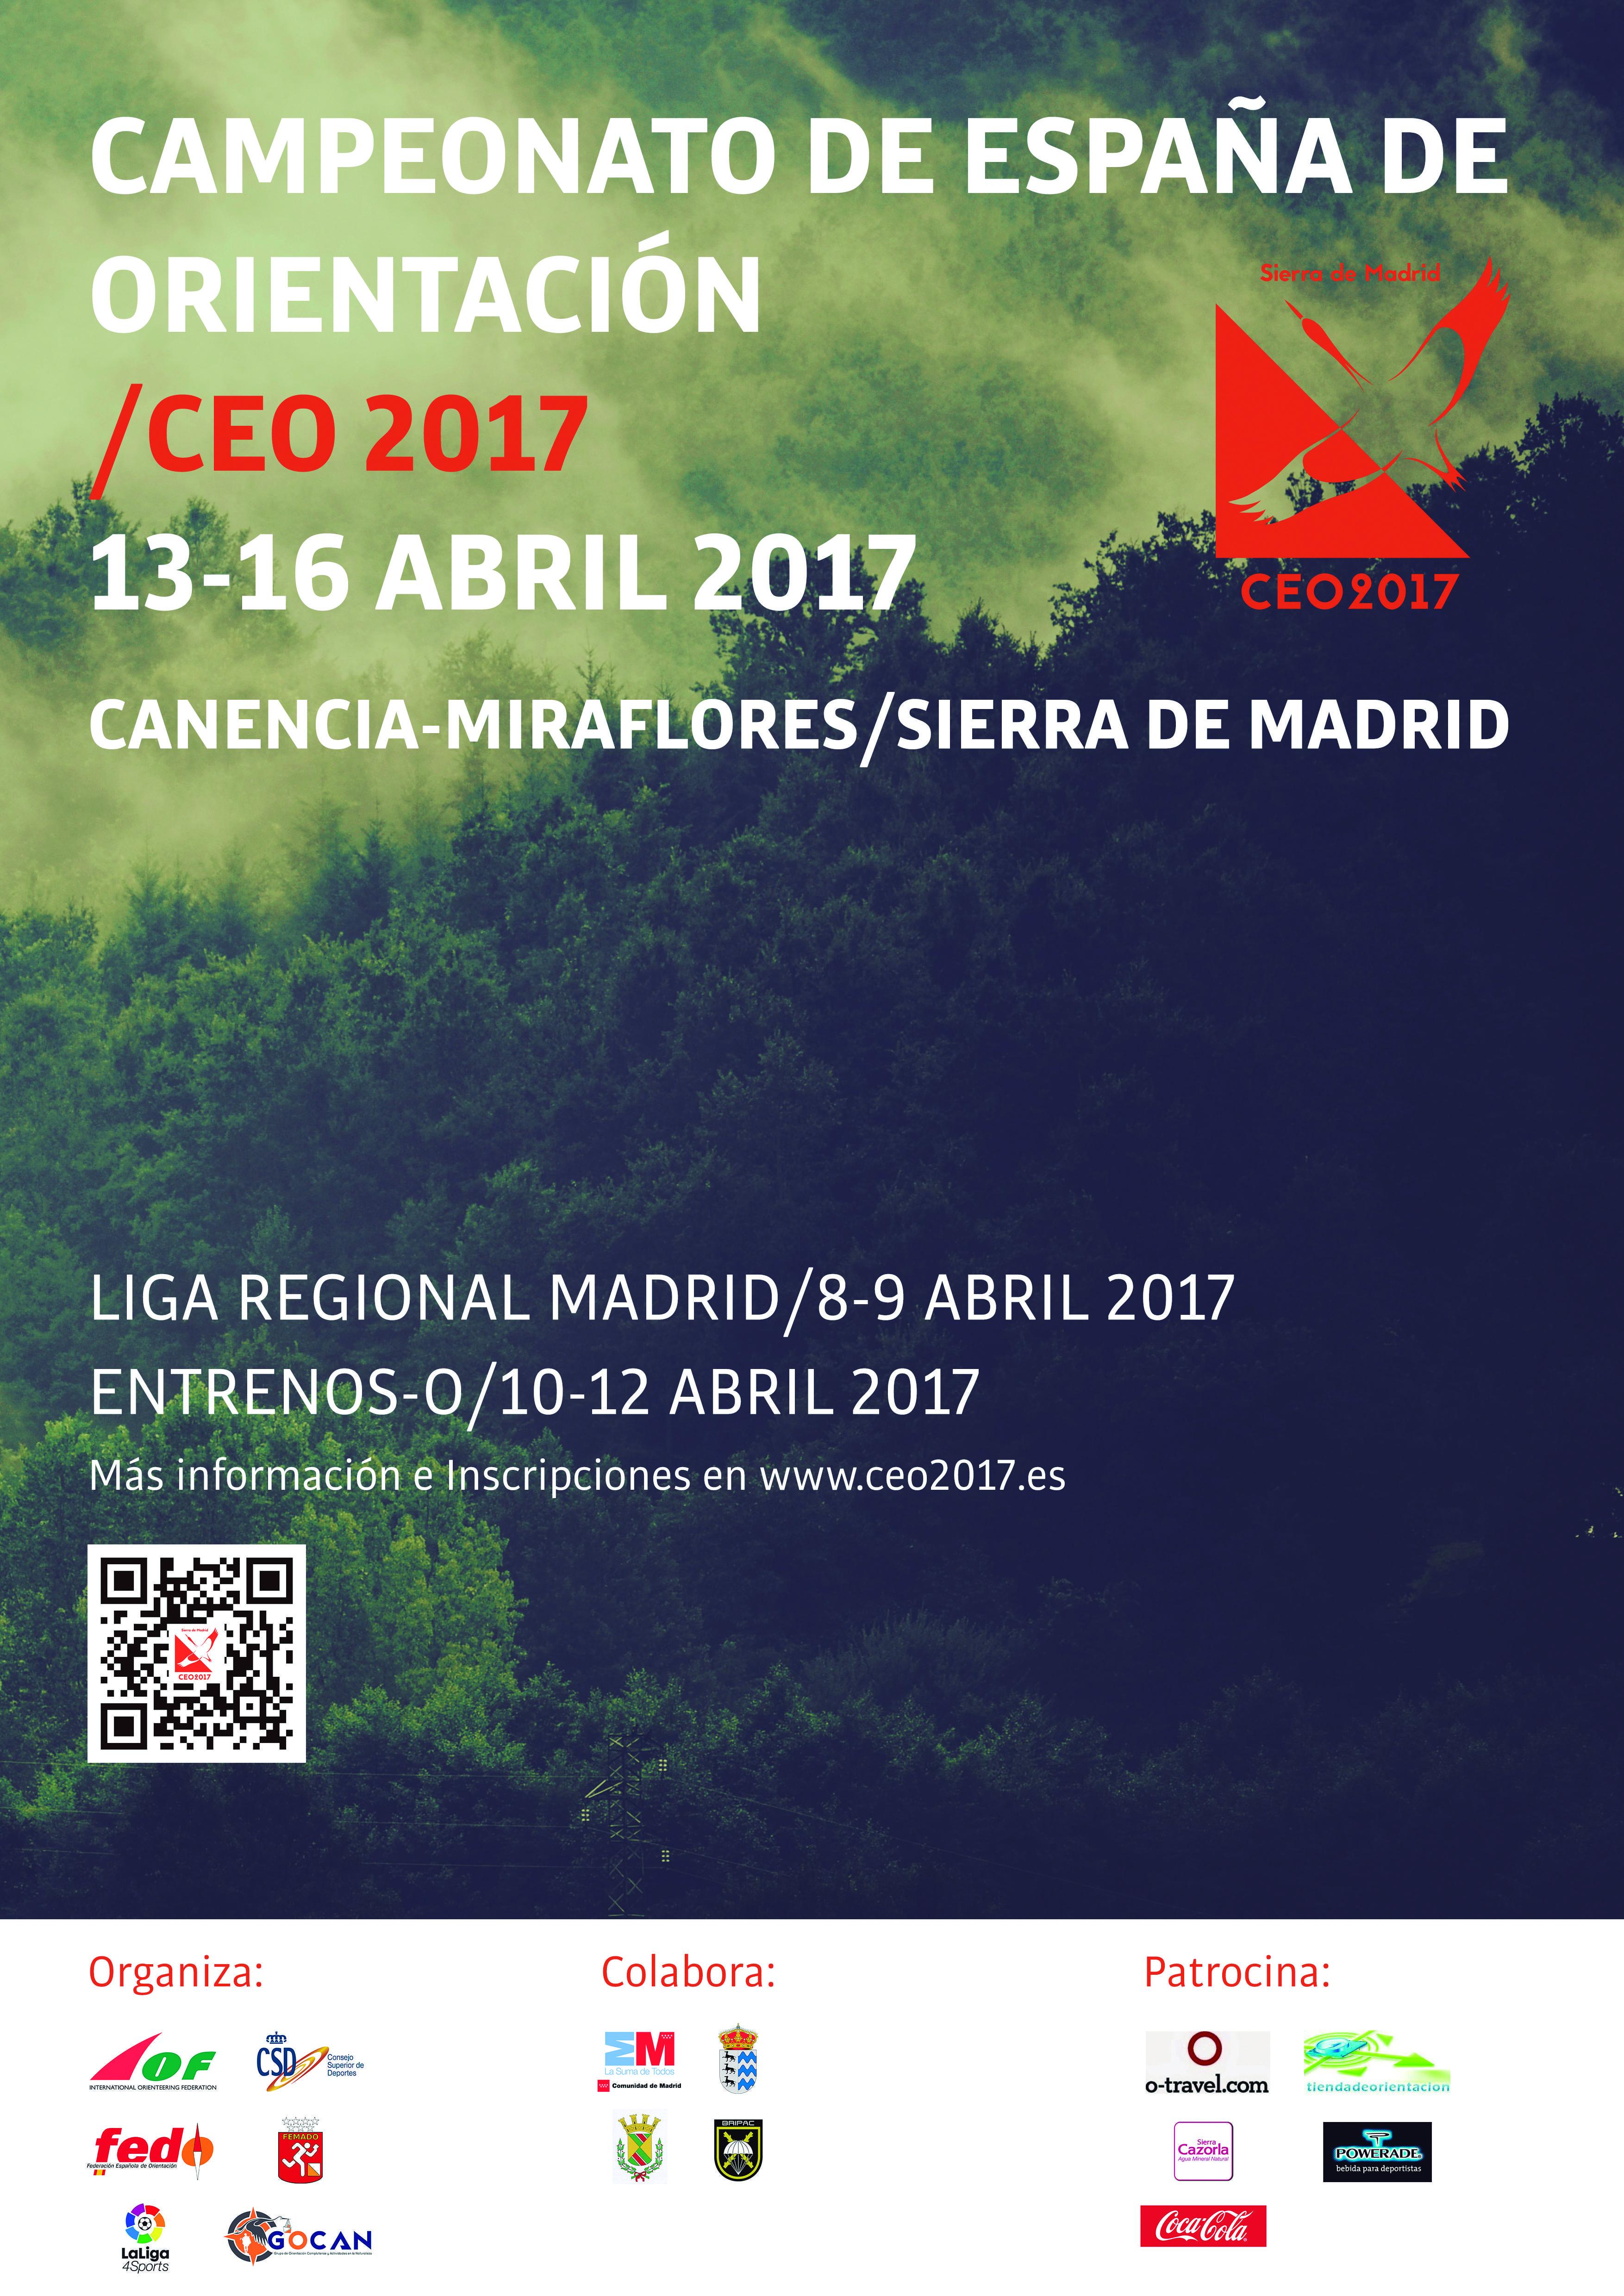 2017- CEO – CAMPEONATO DE ESPAÑA DE ORIENTACIÓN